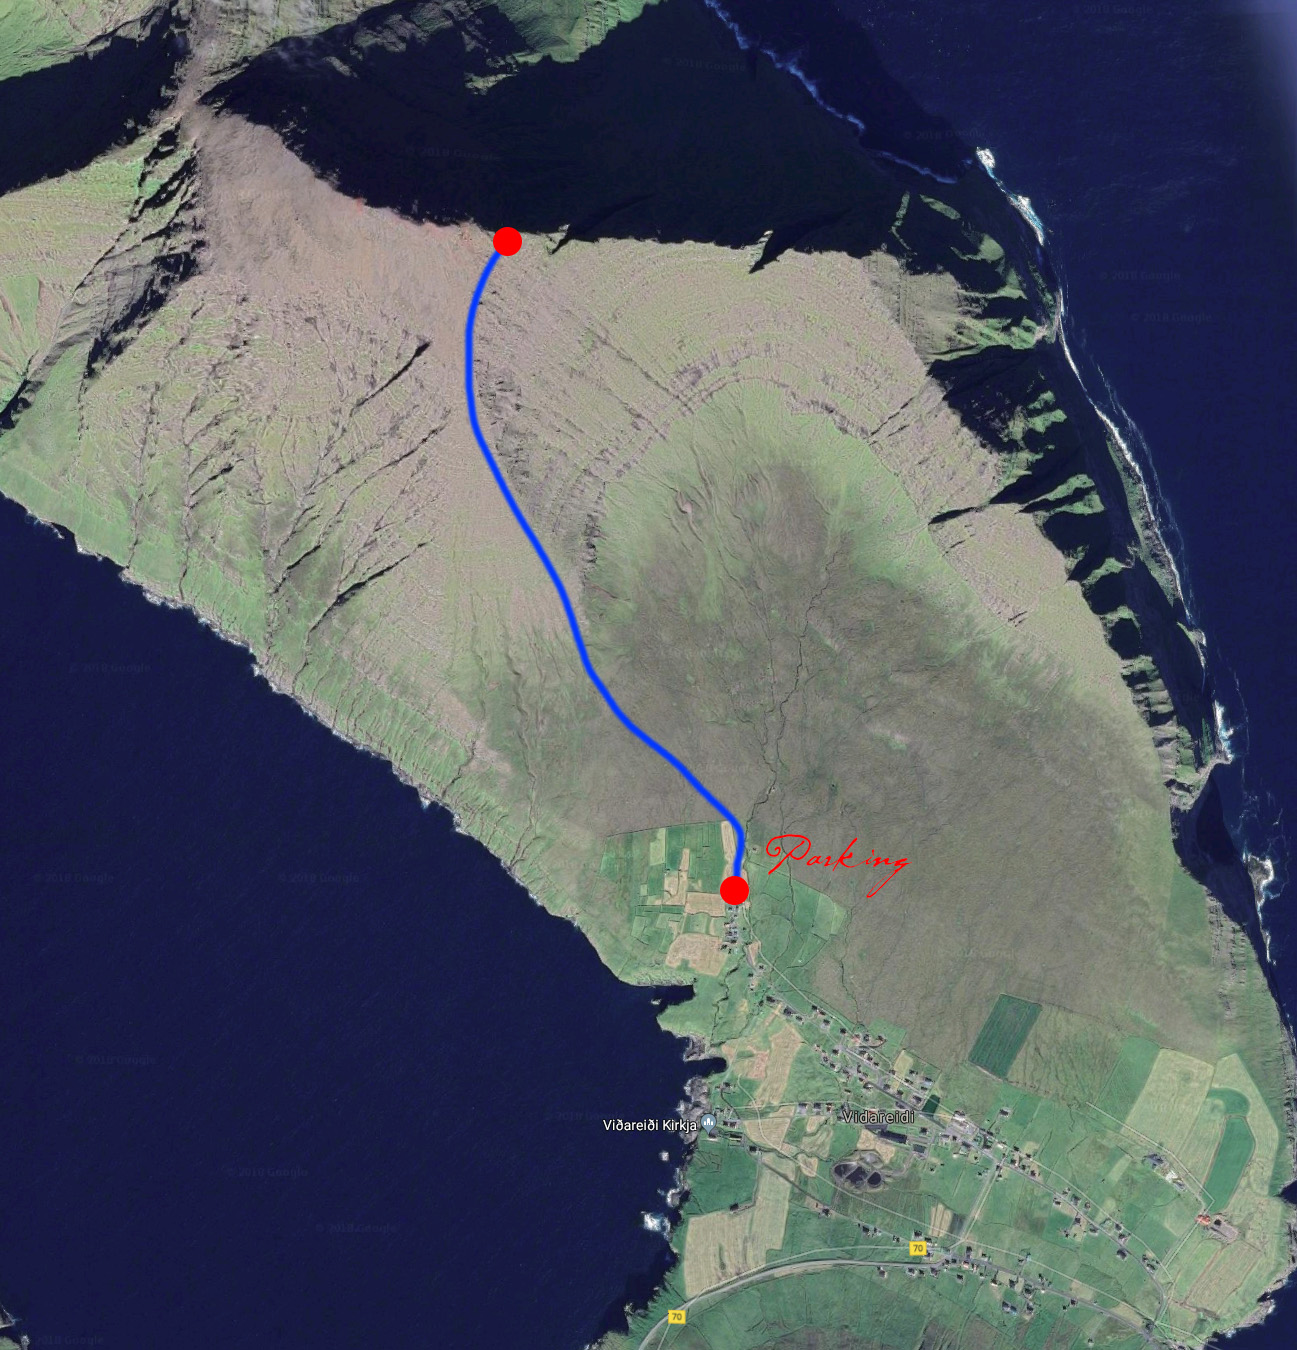 My hike to the peak above Viðareiði